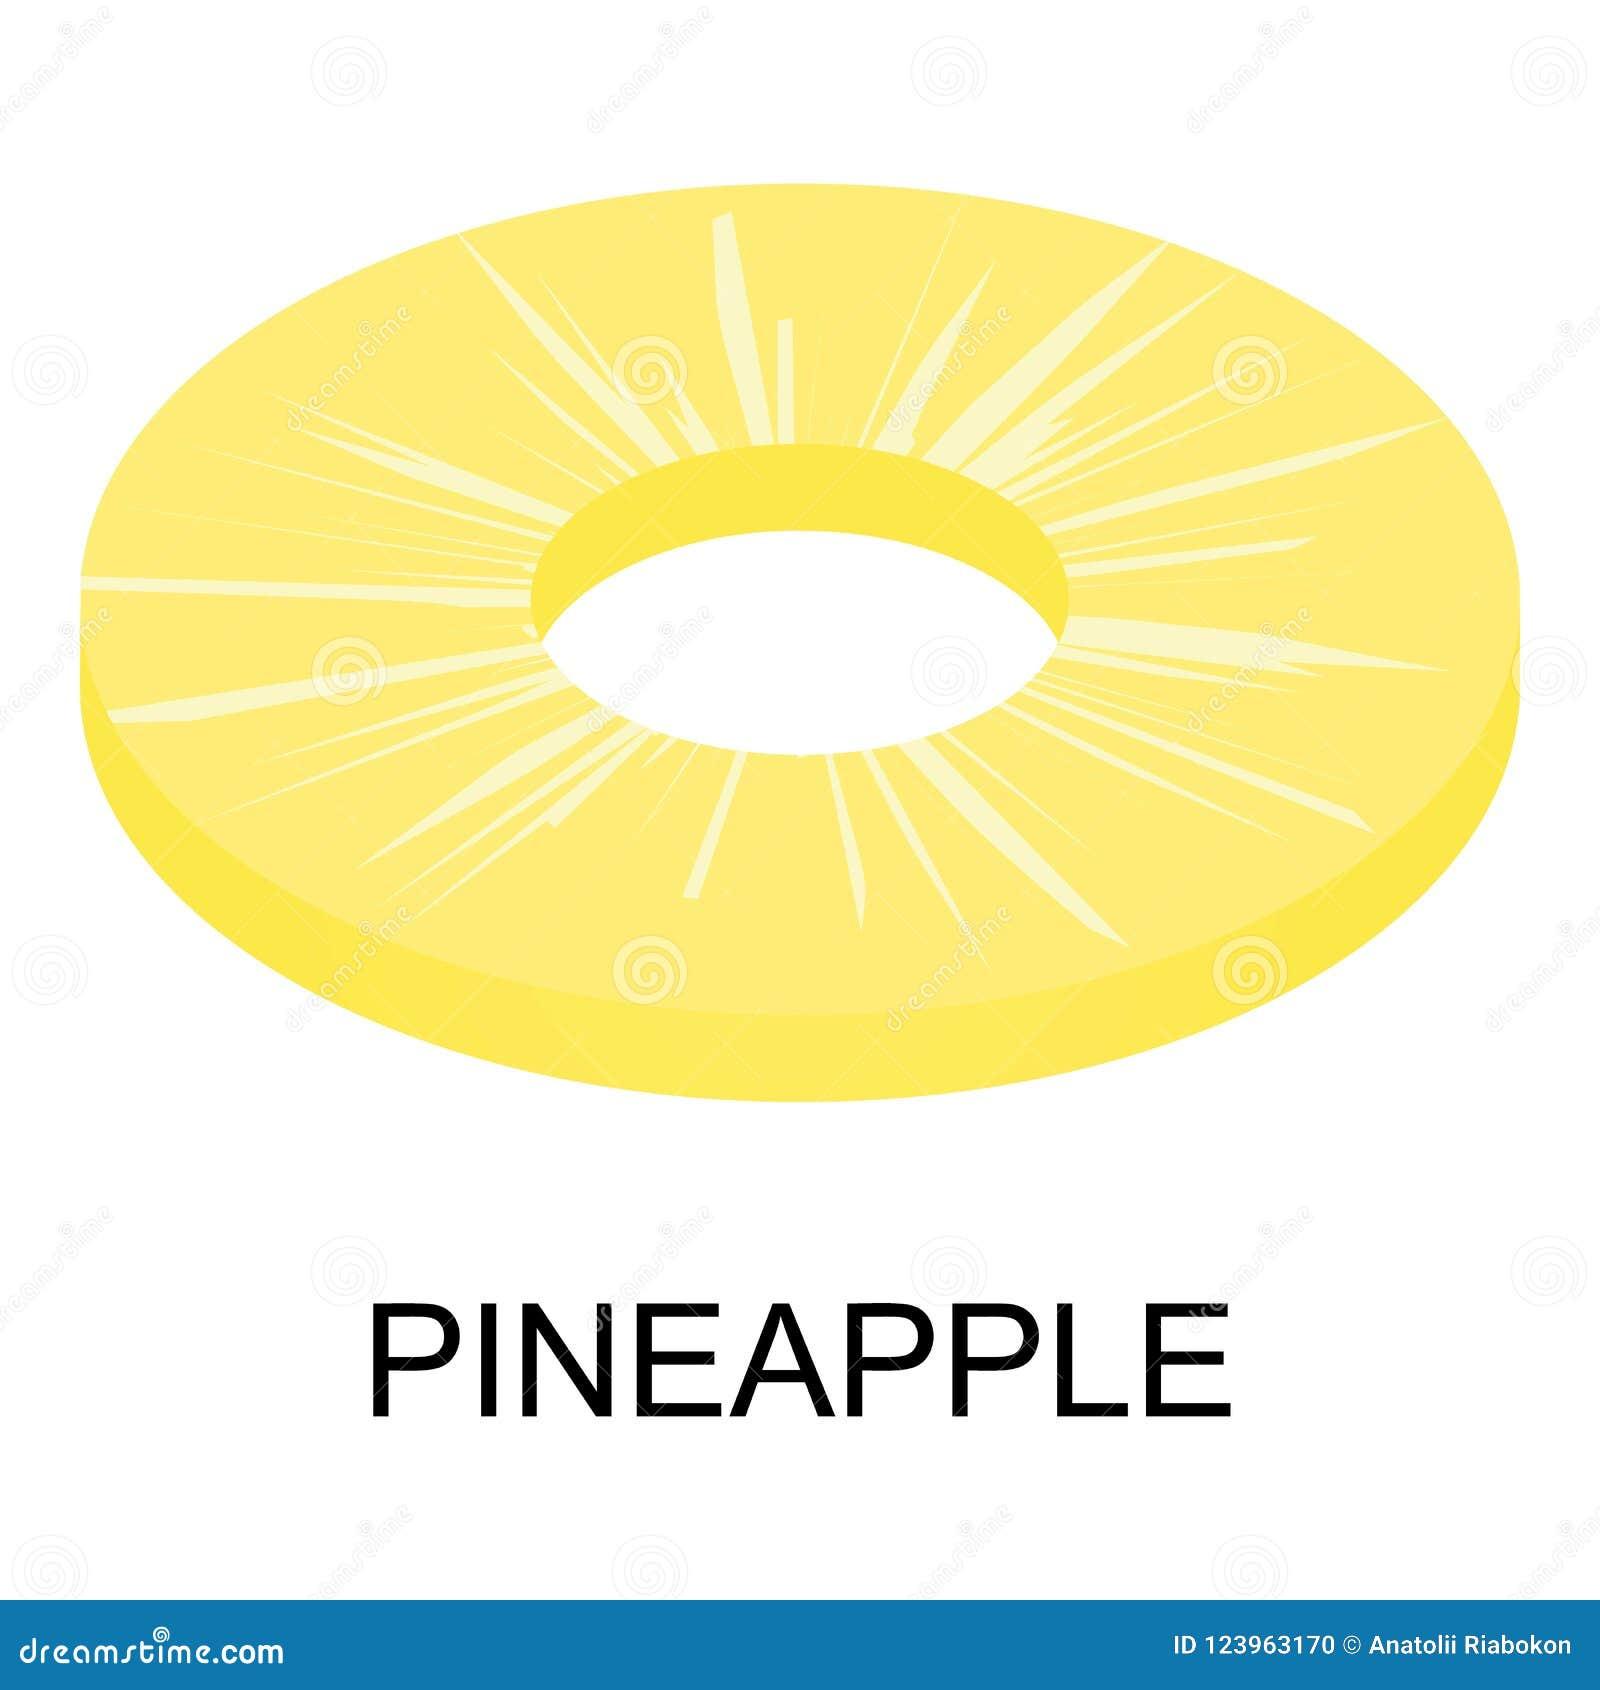 Sliced pineapple icon, isometric style